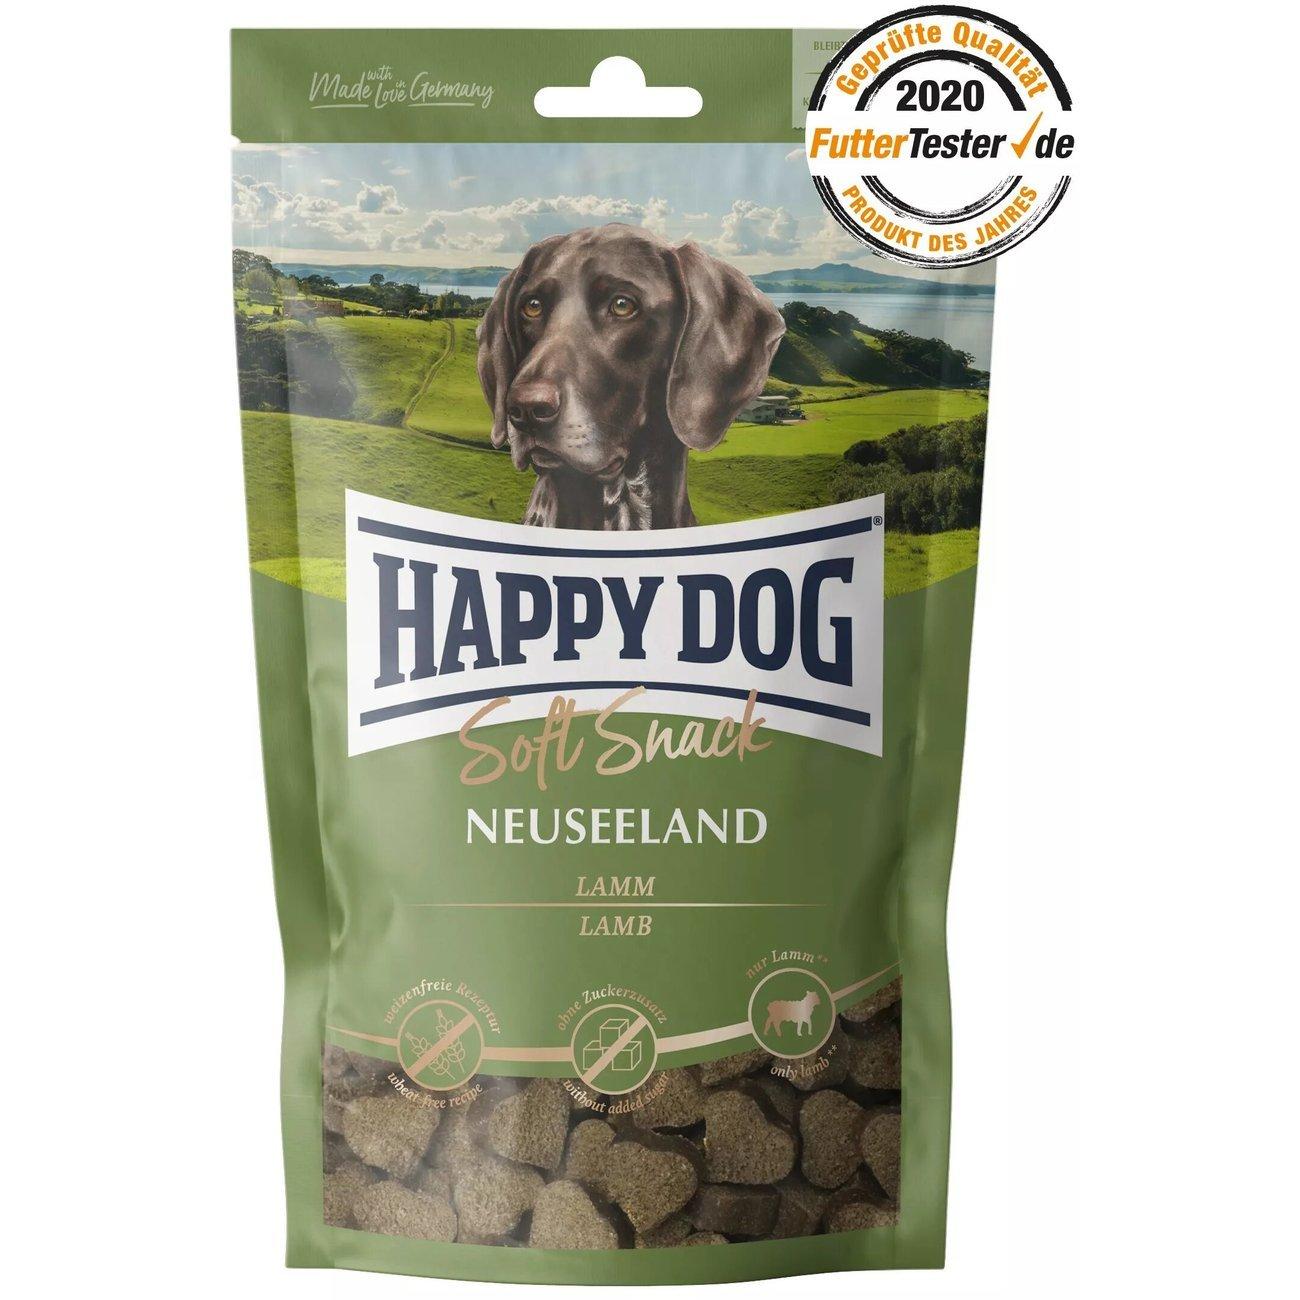 Happy Dog Soft Snack Supreme Neuseeland Lamm Reis, 100g